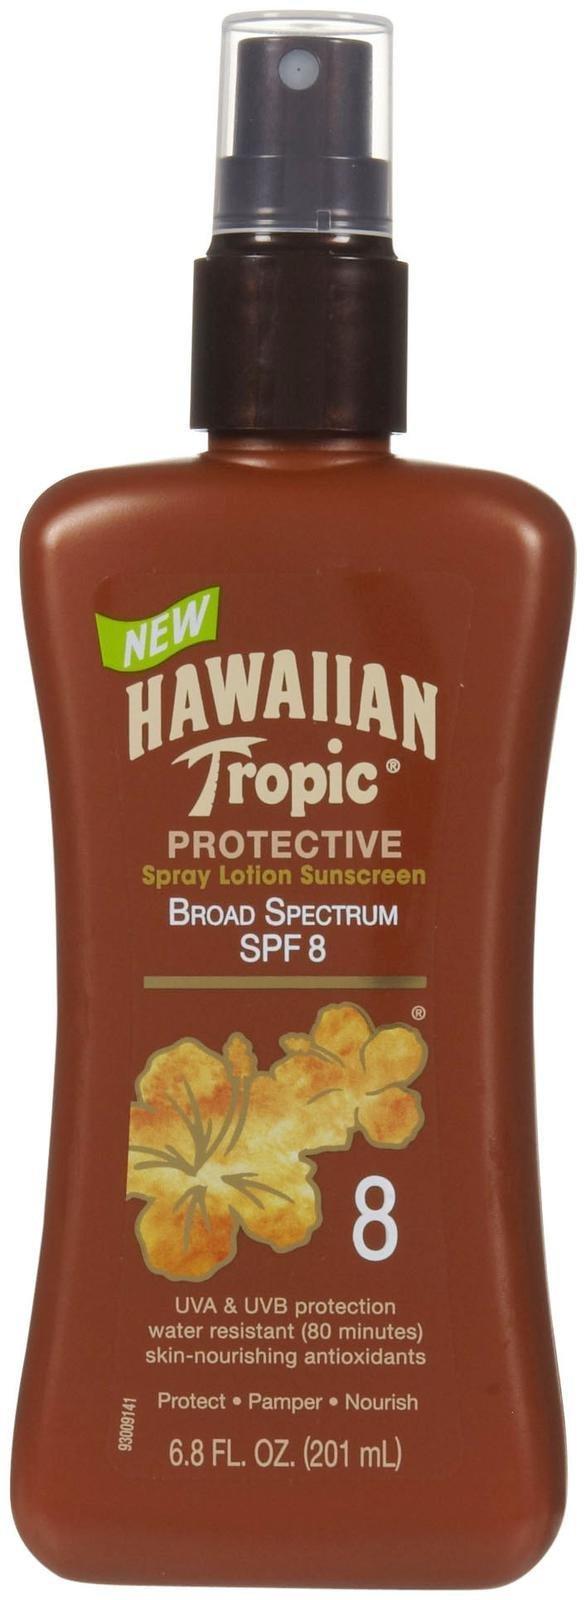 Hawaiian Tropic Protective Tanning Pump Lotion, SPF 8, 6.8 fl oz by Hawaiian Tropic